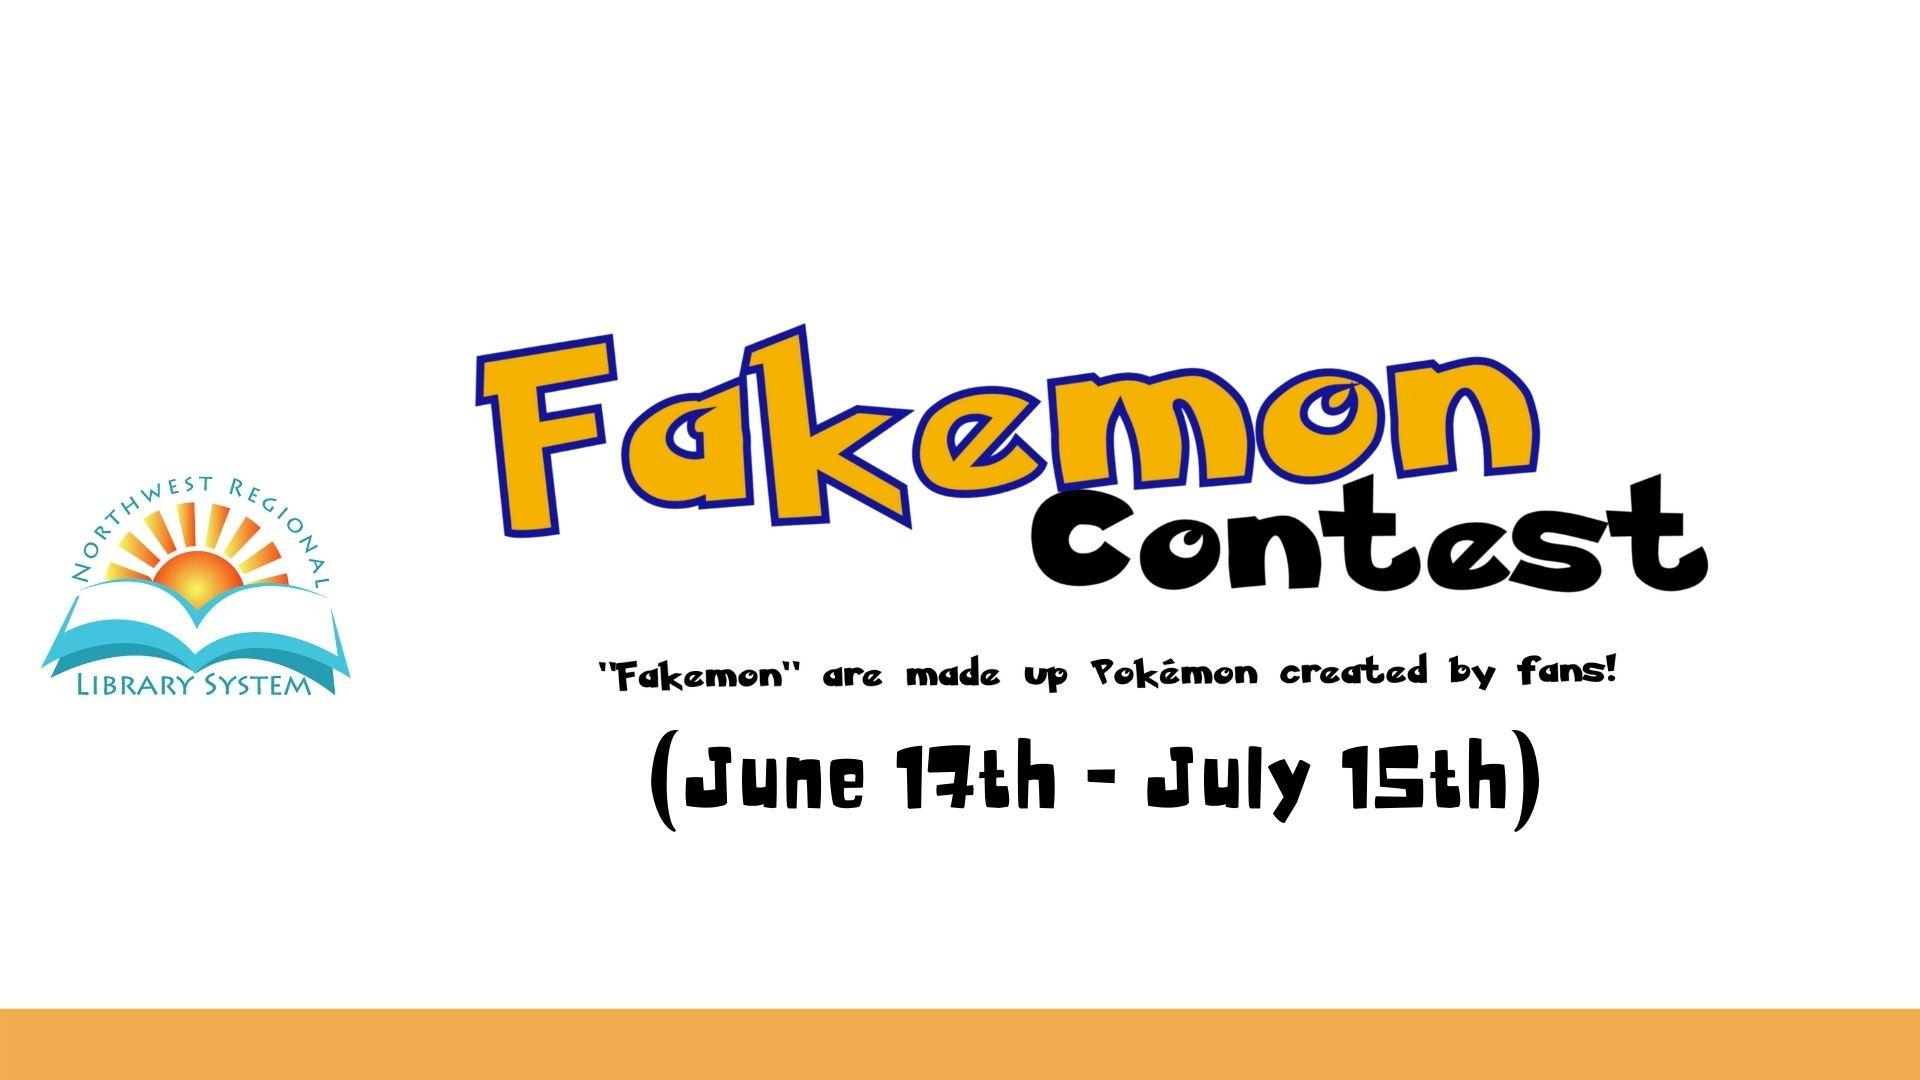 Fakemon Contest